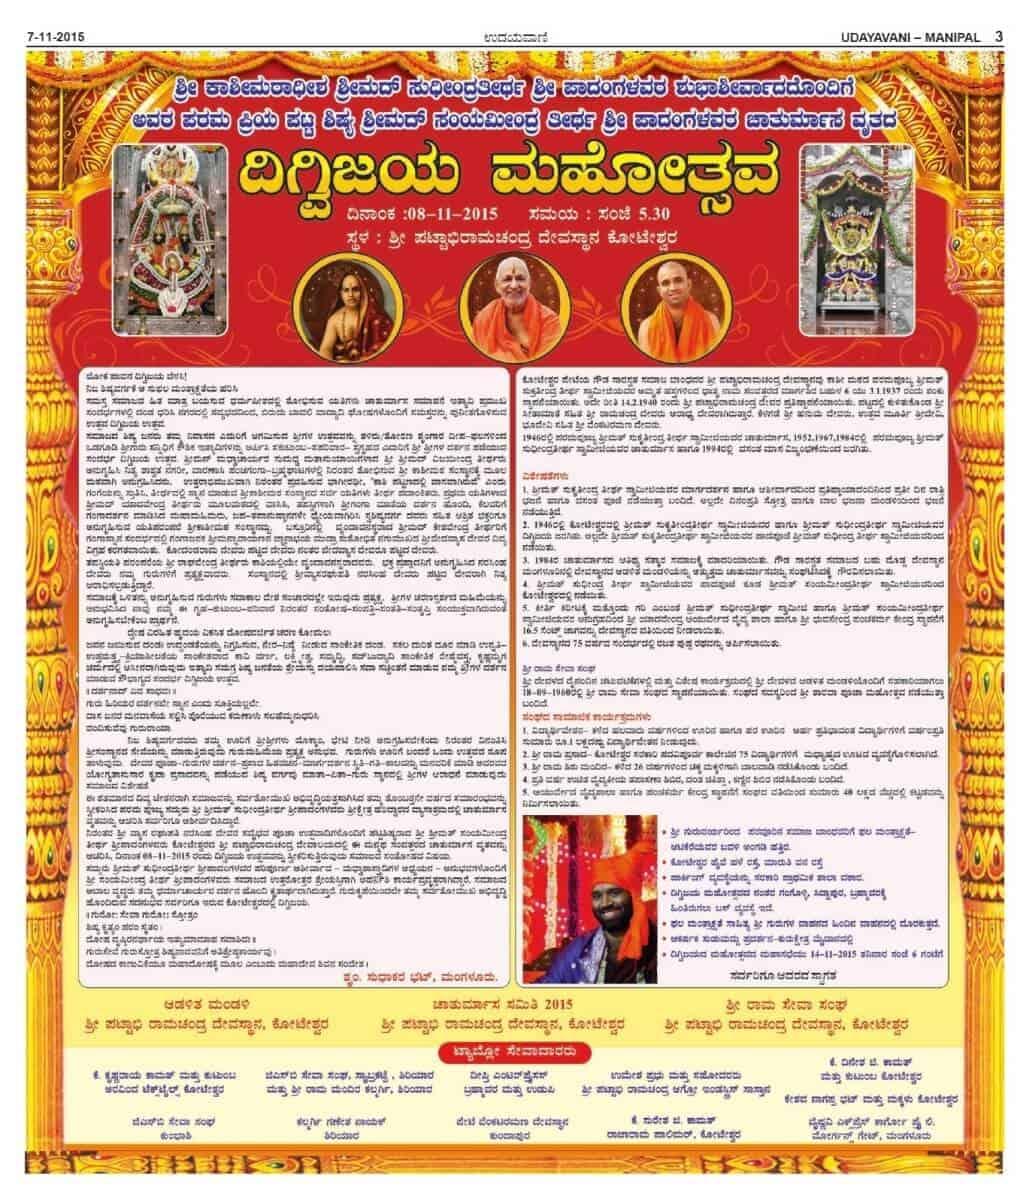 Image from post regarding Digvijaya Mahotsava in Koteshwara